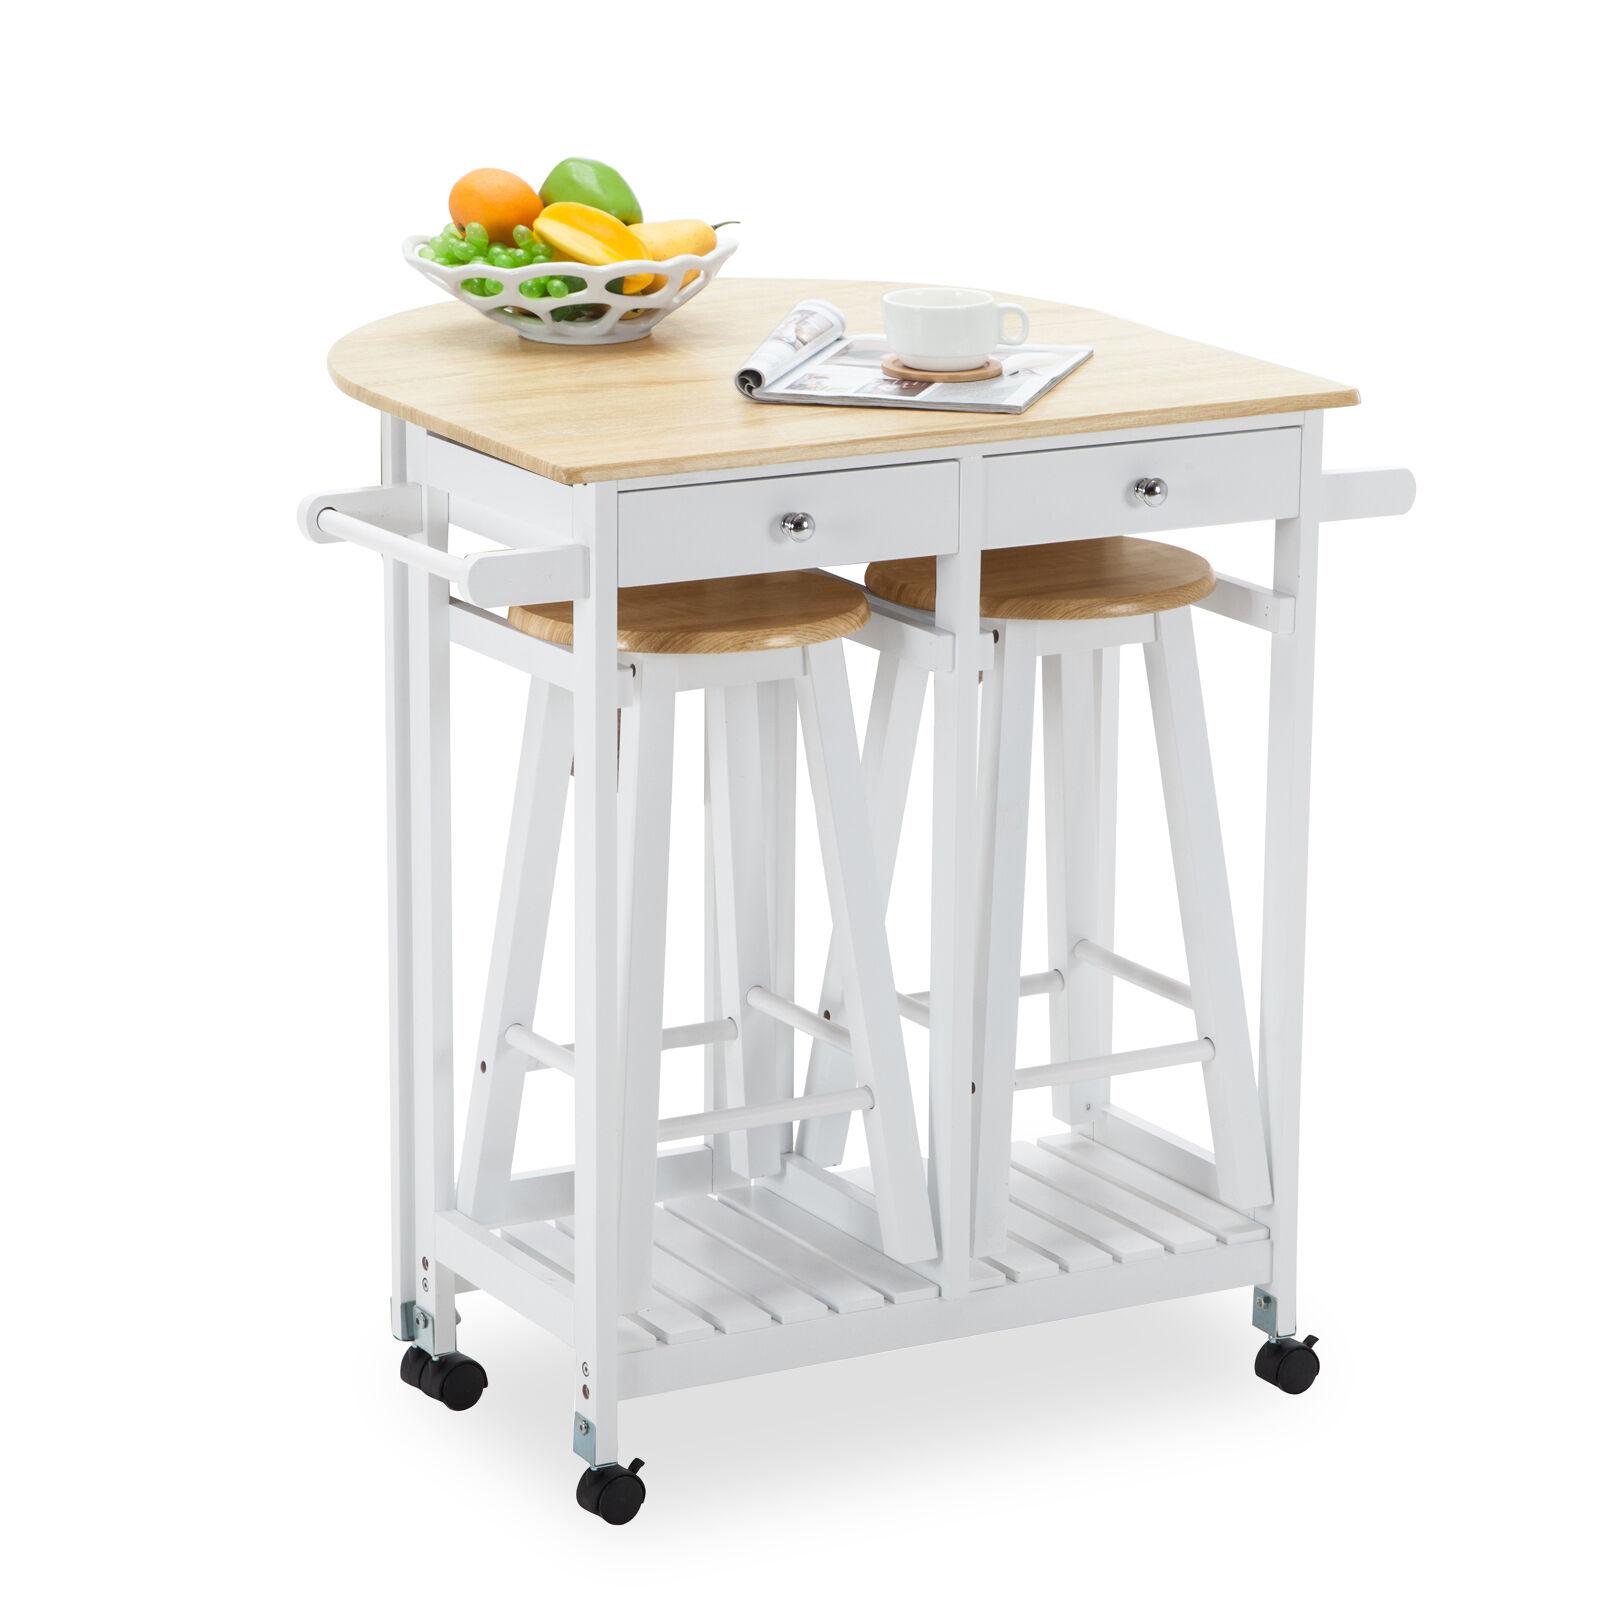 Oak Kitchen Island Cart Trolley Storage Dining Table 2 Bar Stools